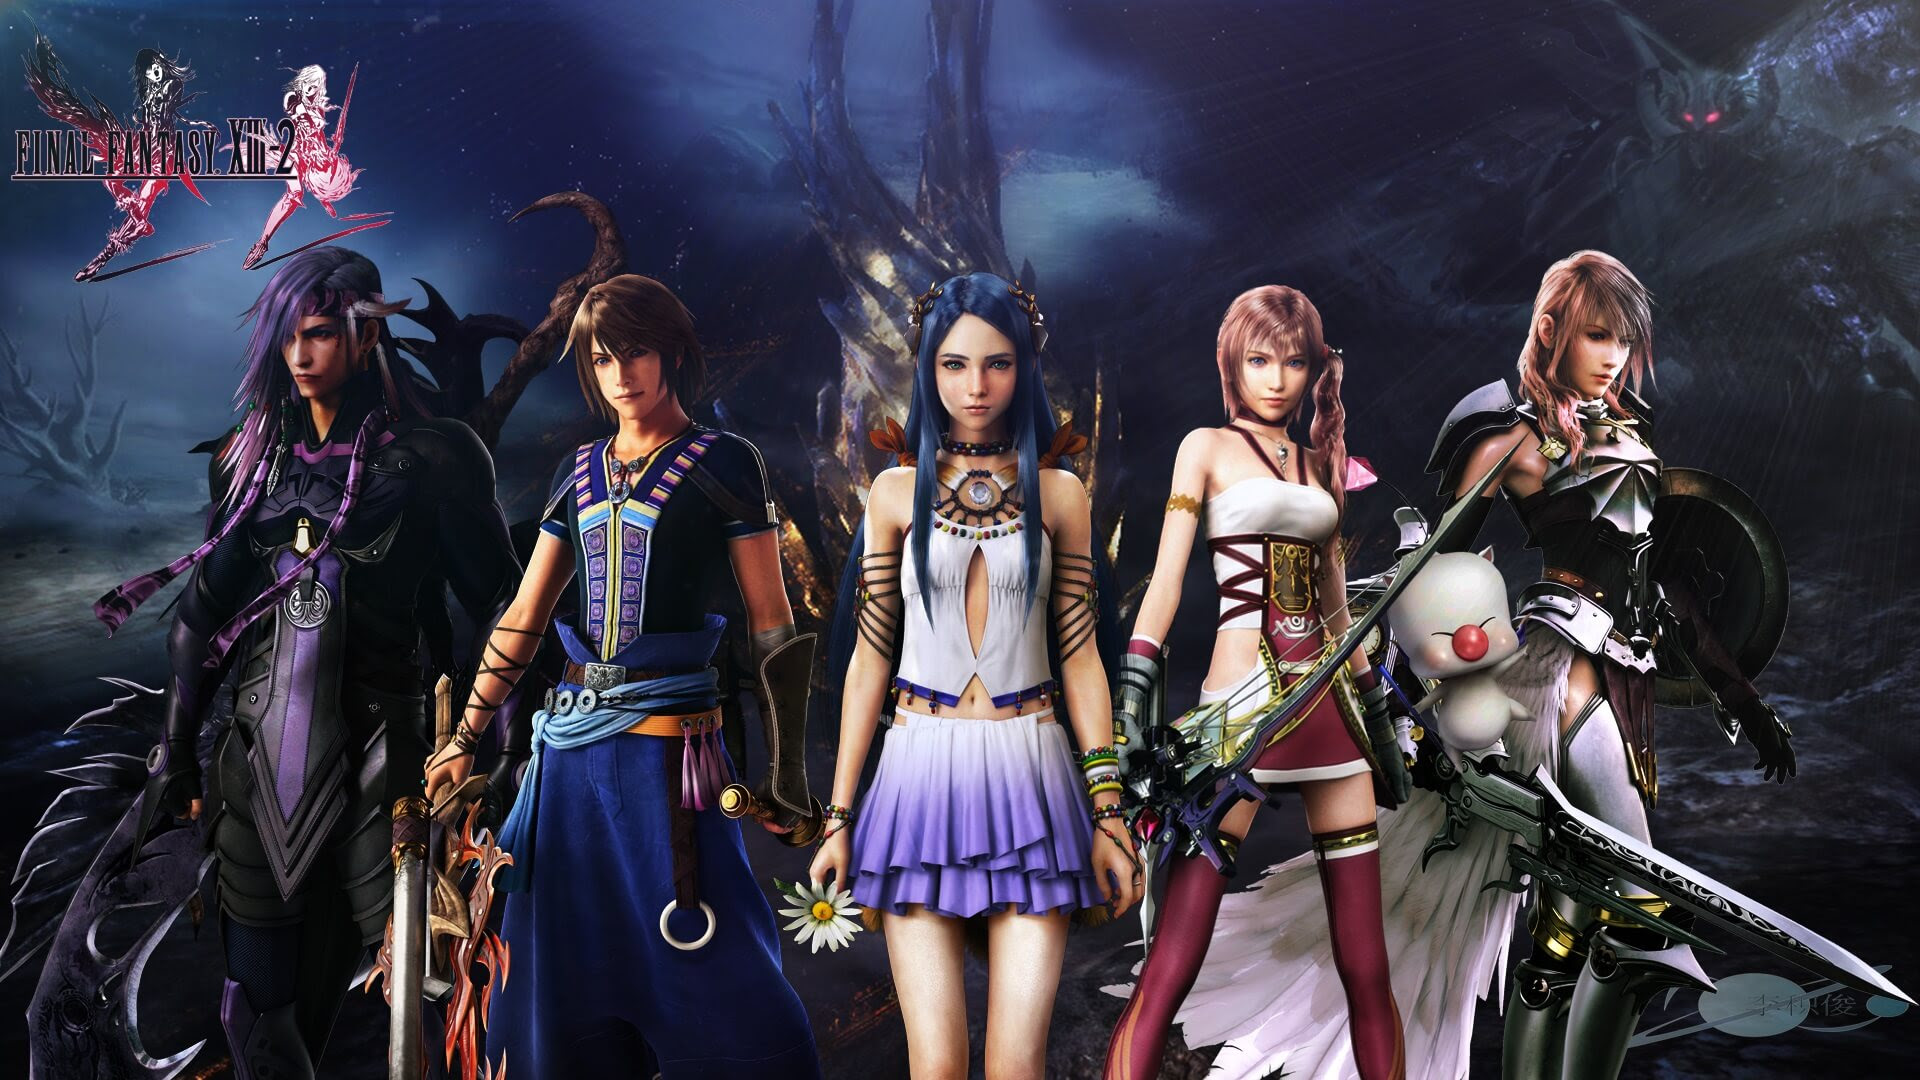 Final Fantasy Xiii 2 Walkthrough Episode 1 New Bodhum Part 1